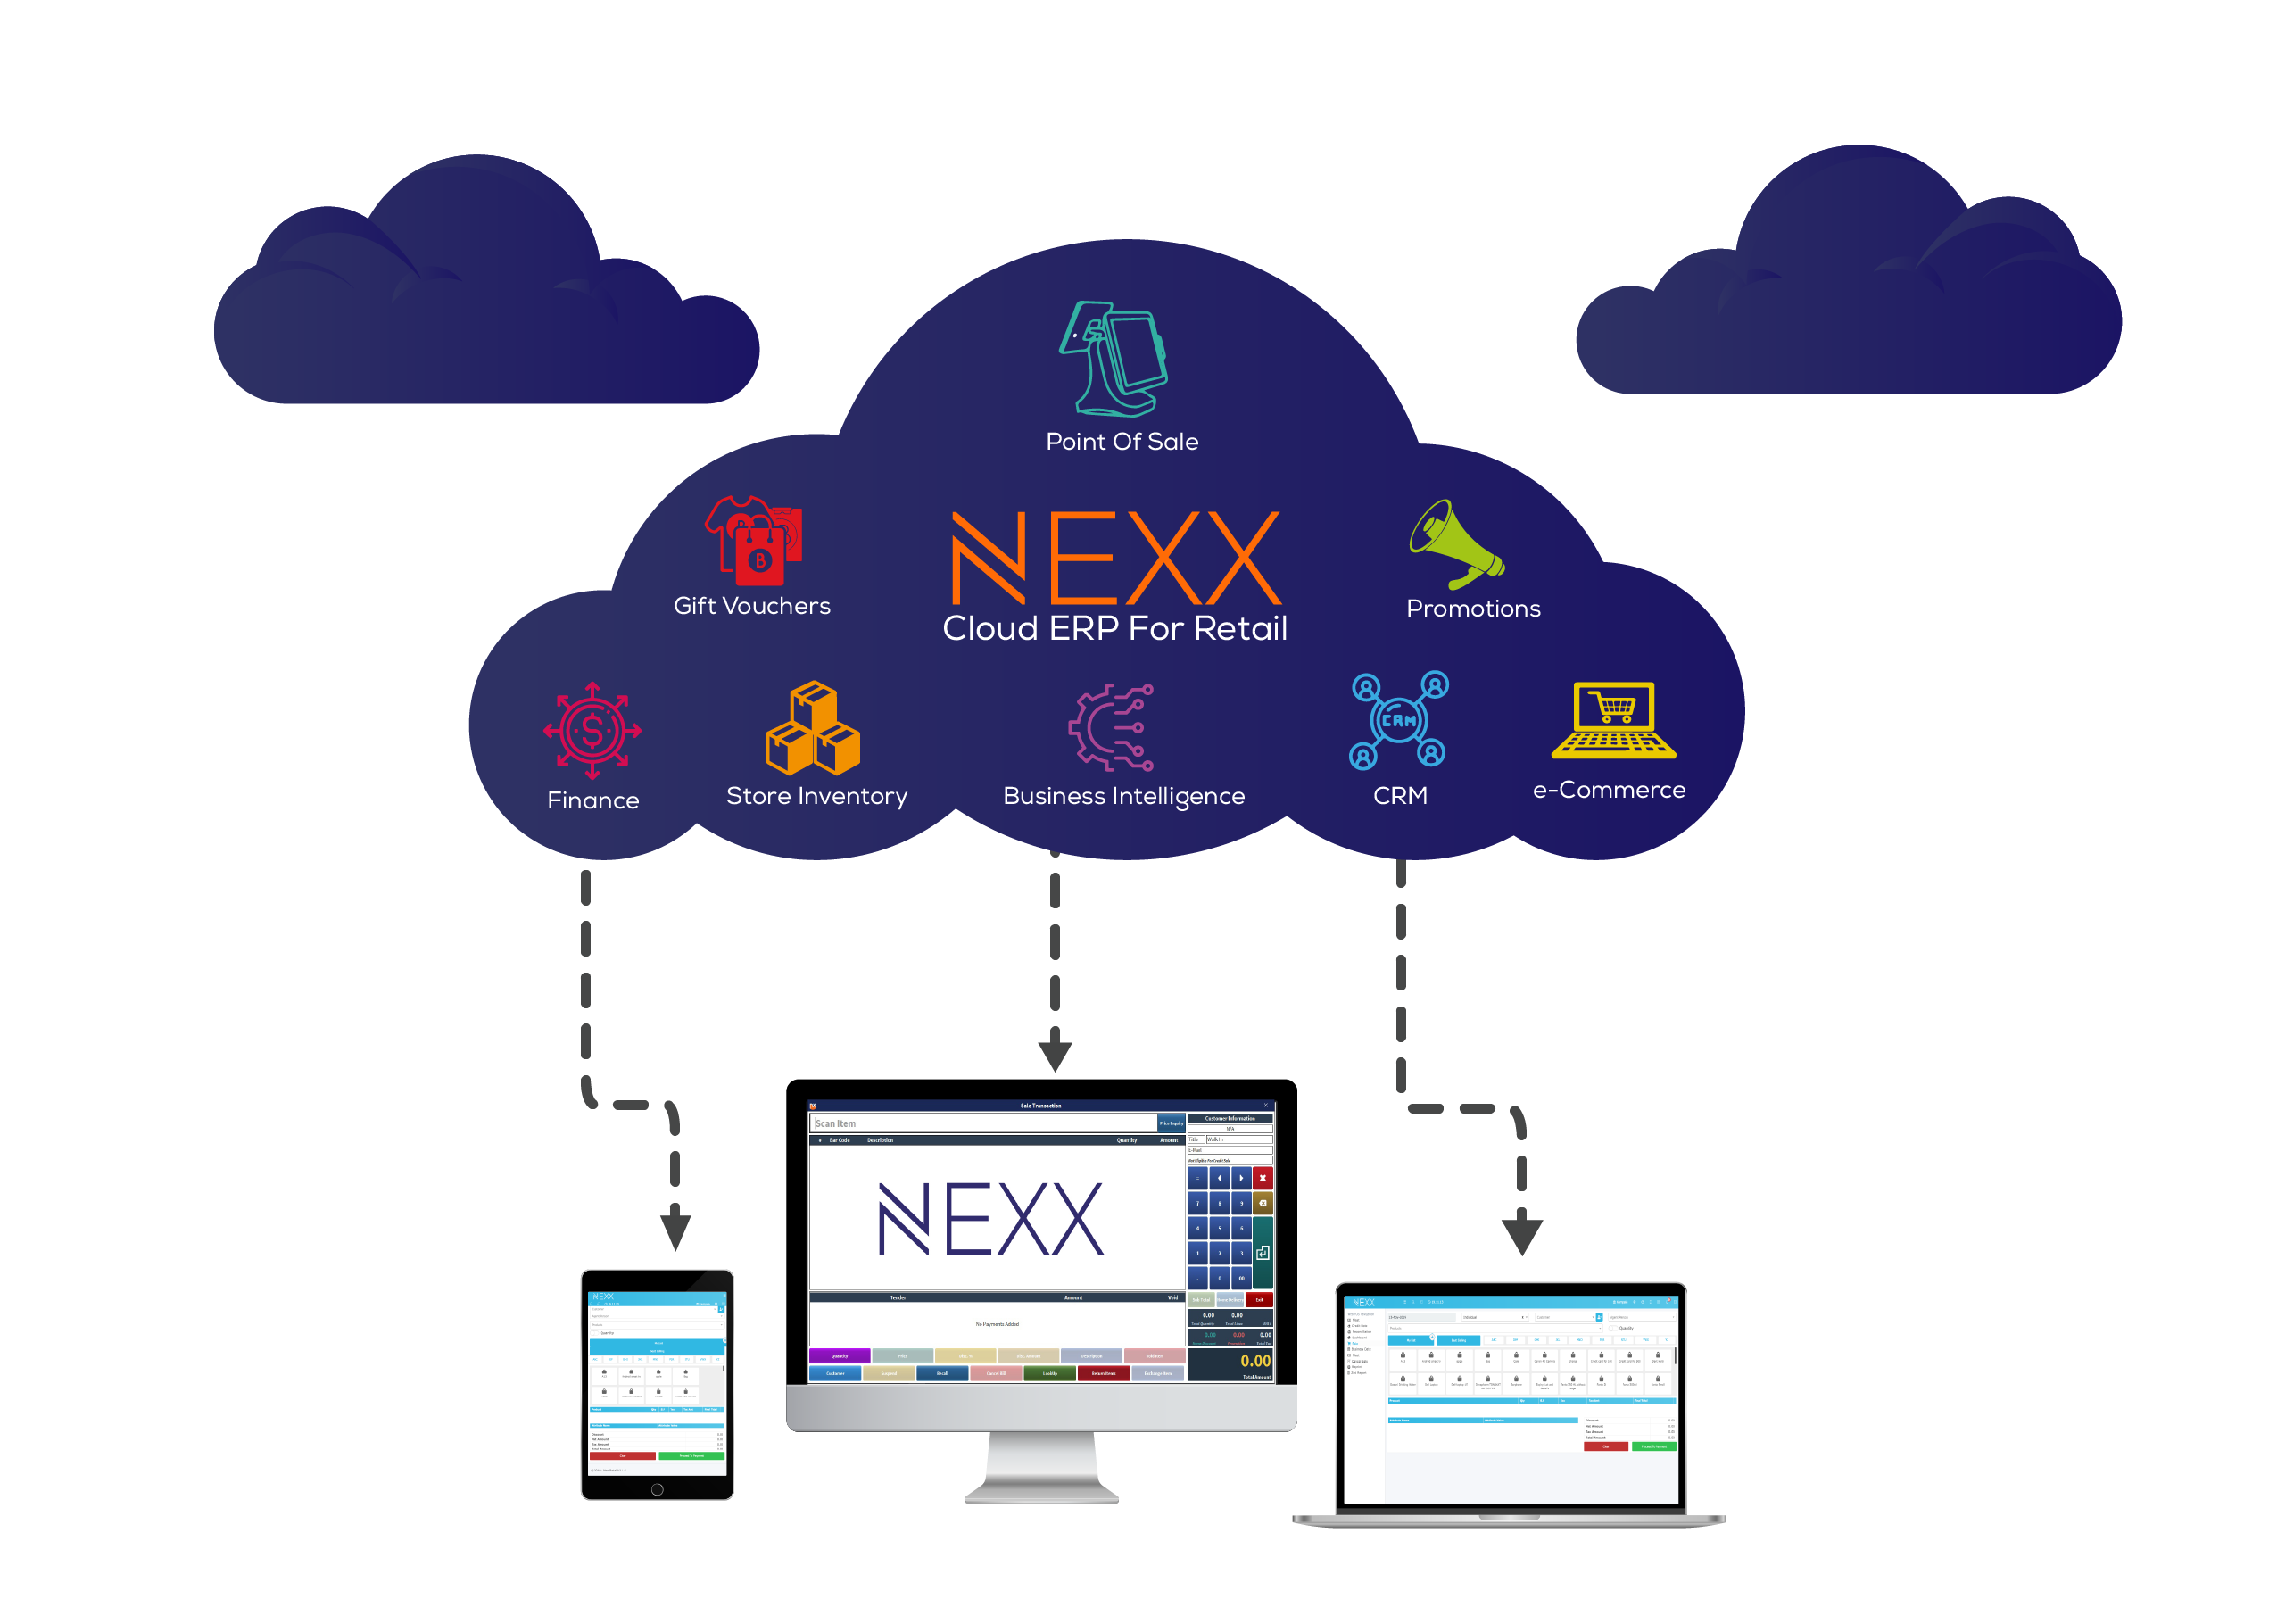 NEXX Cloud ERP